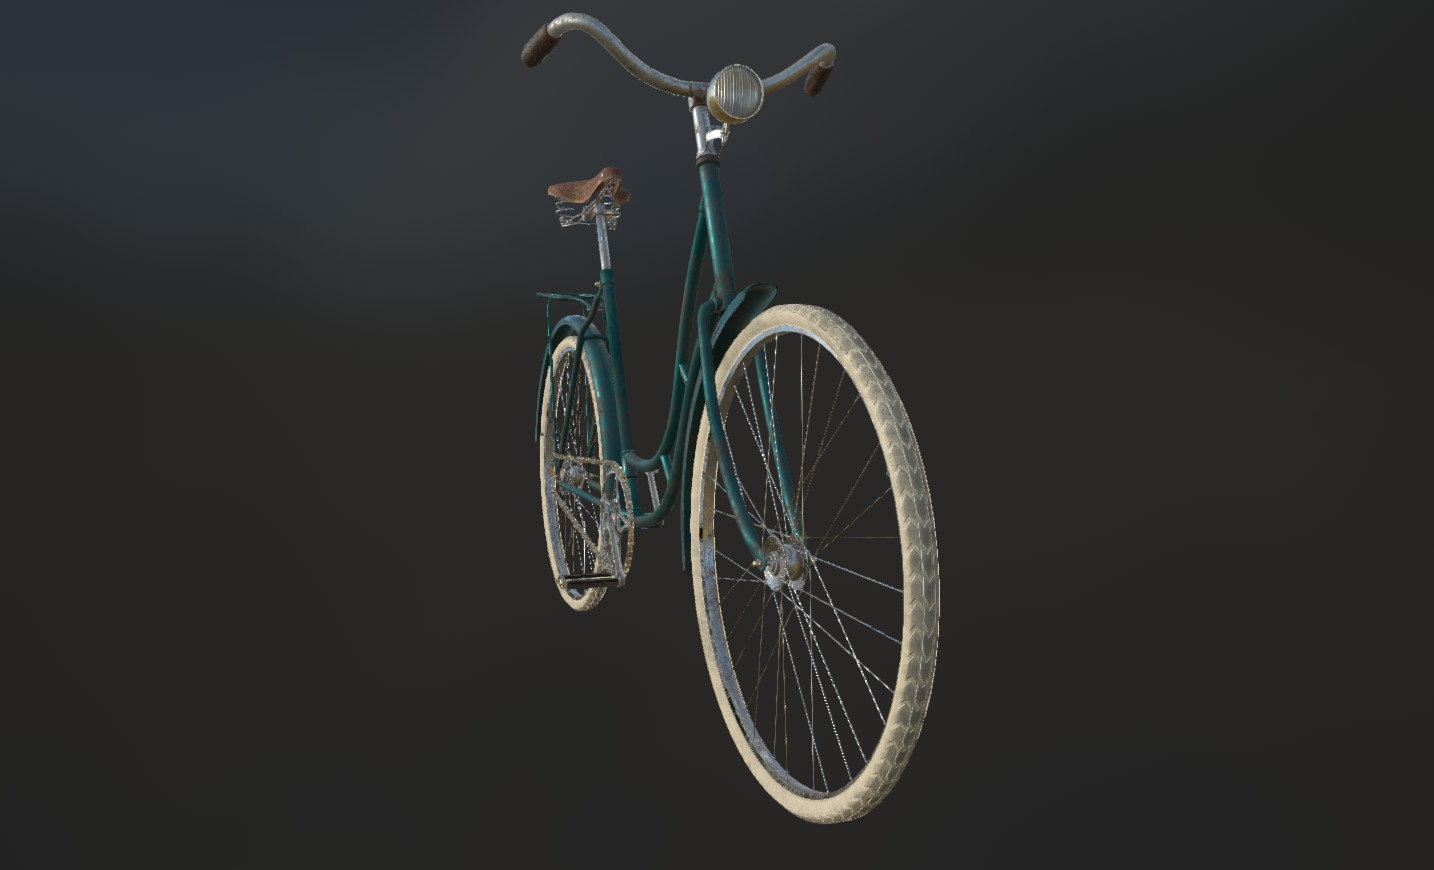 Litha bacchi bike07